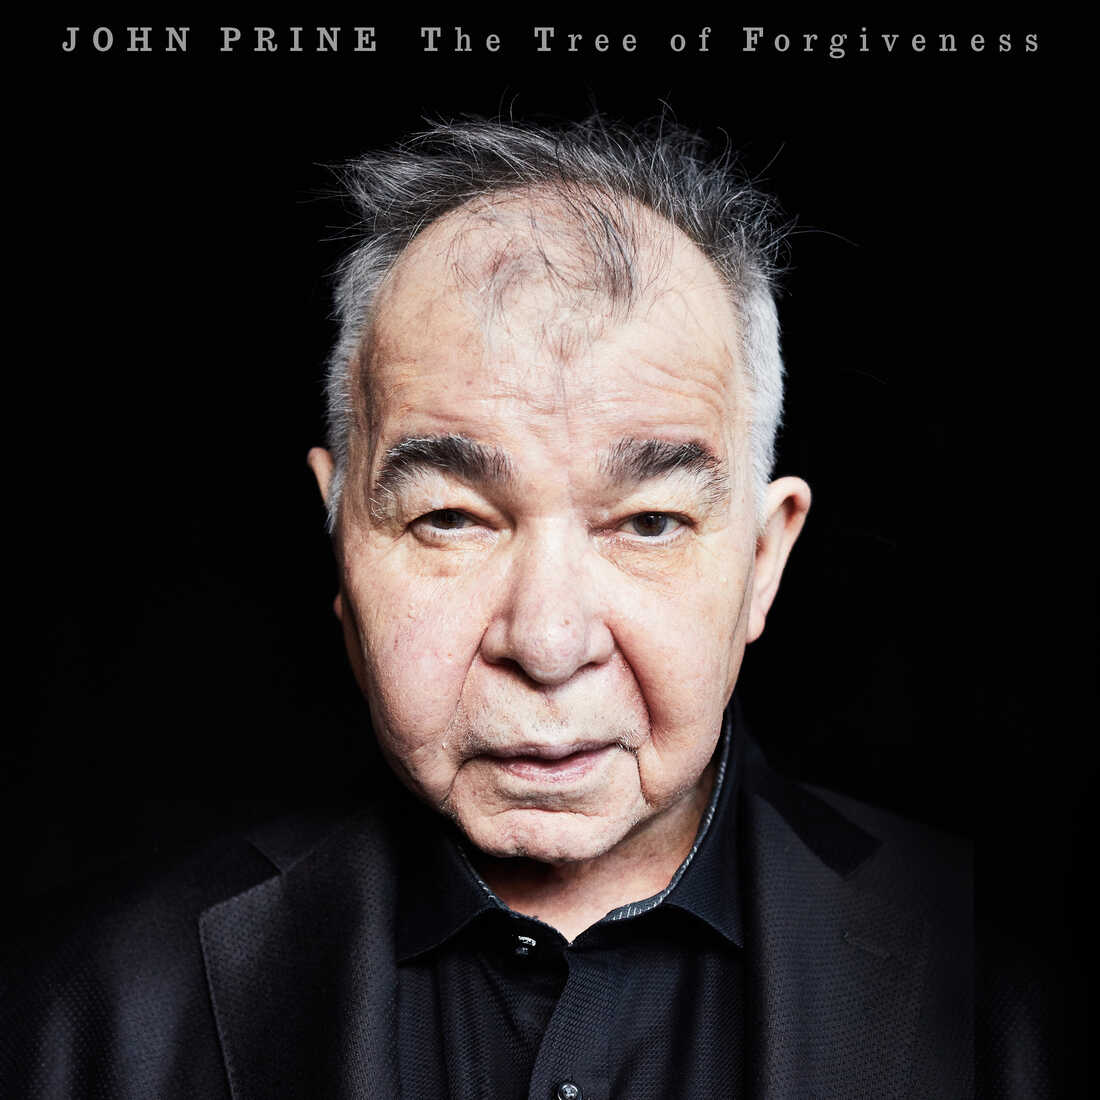 John Prine, The Tree Of Forgiveness